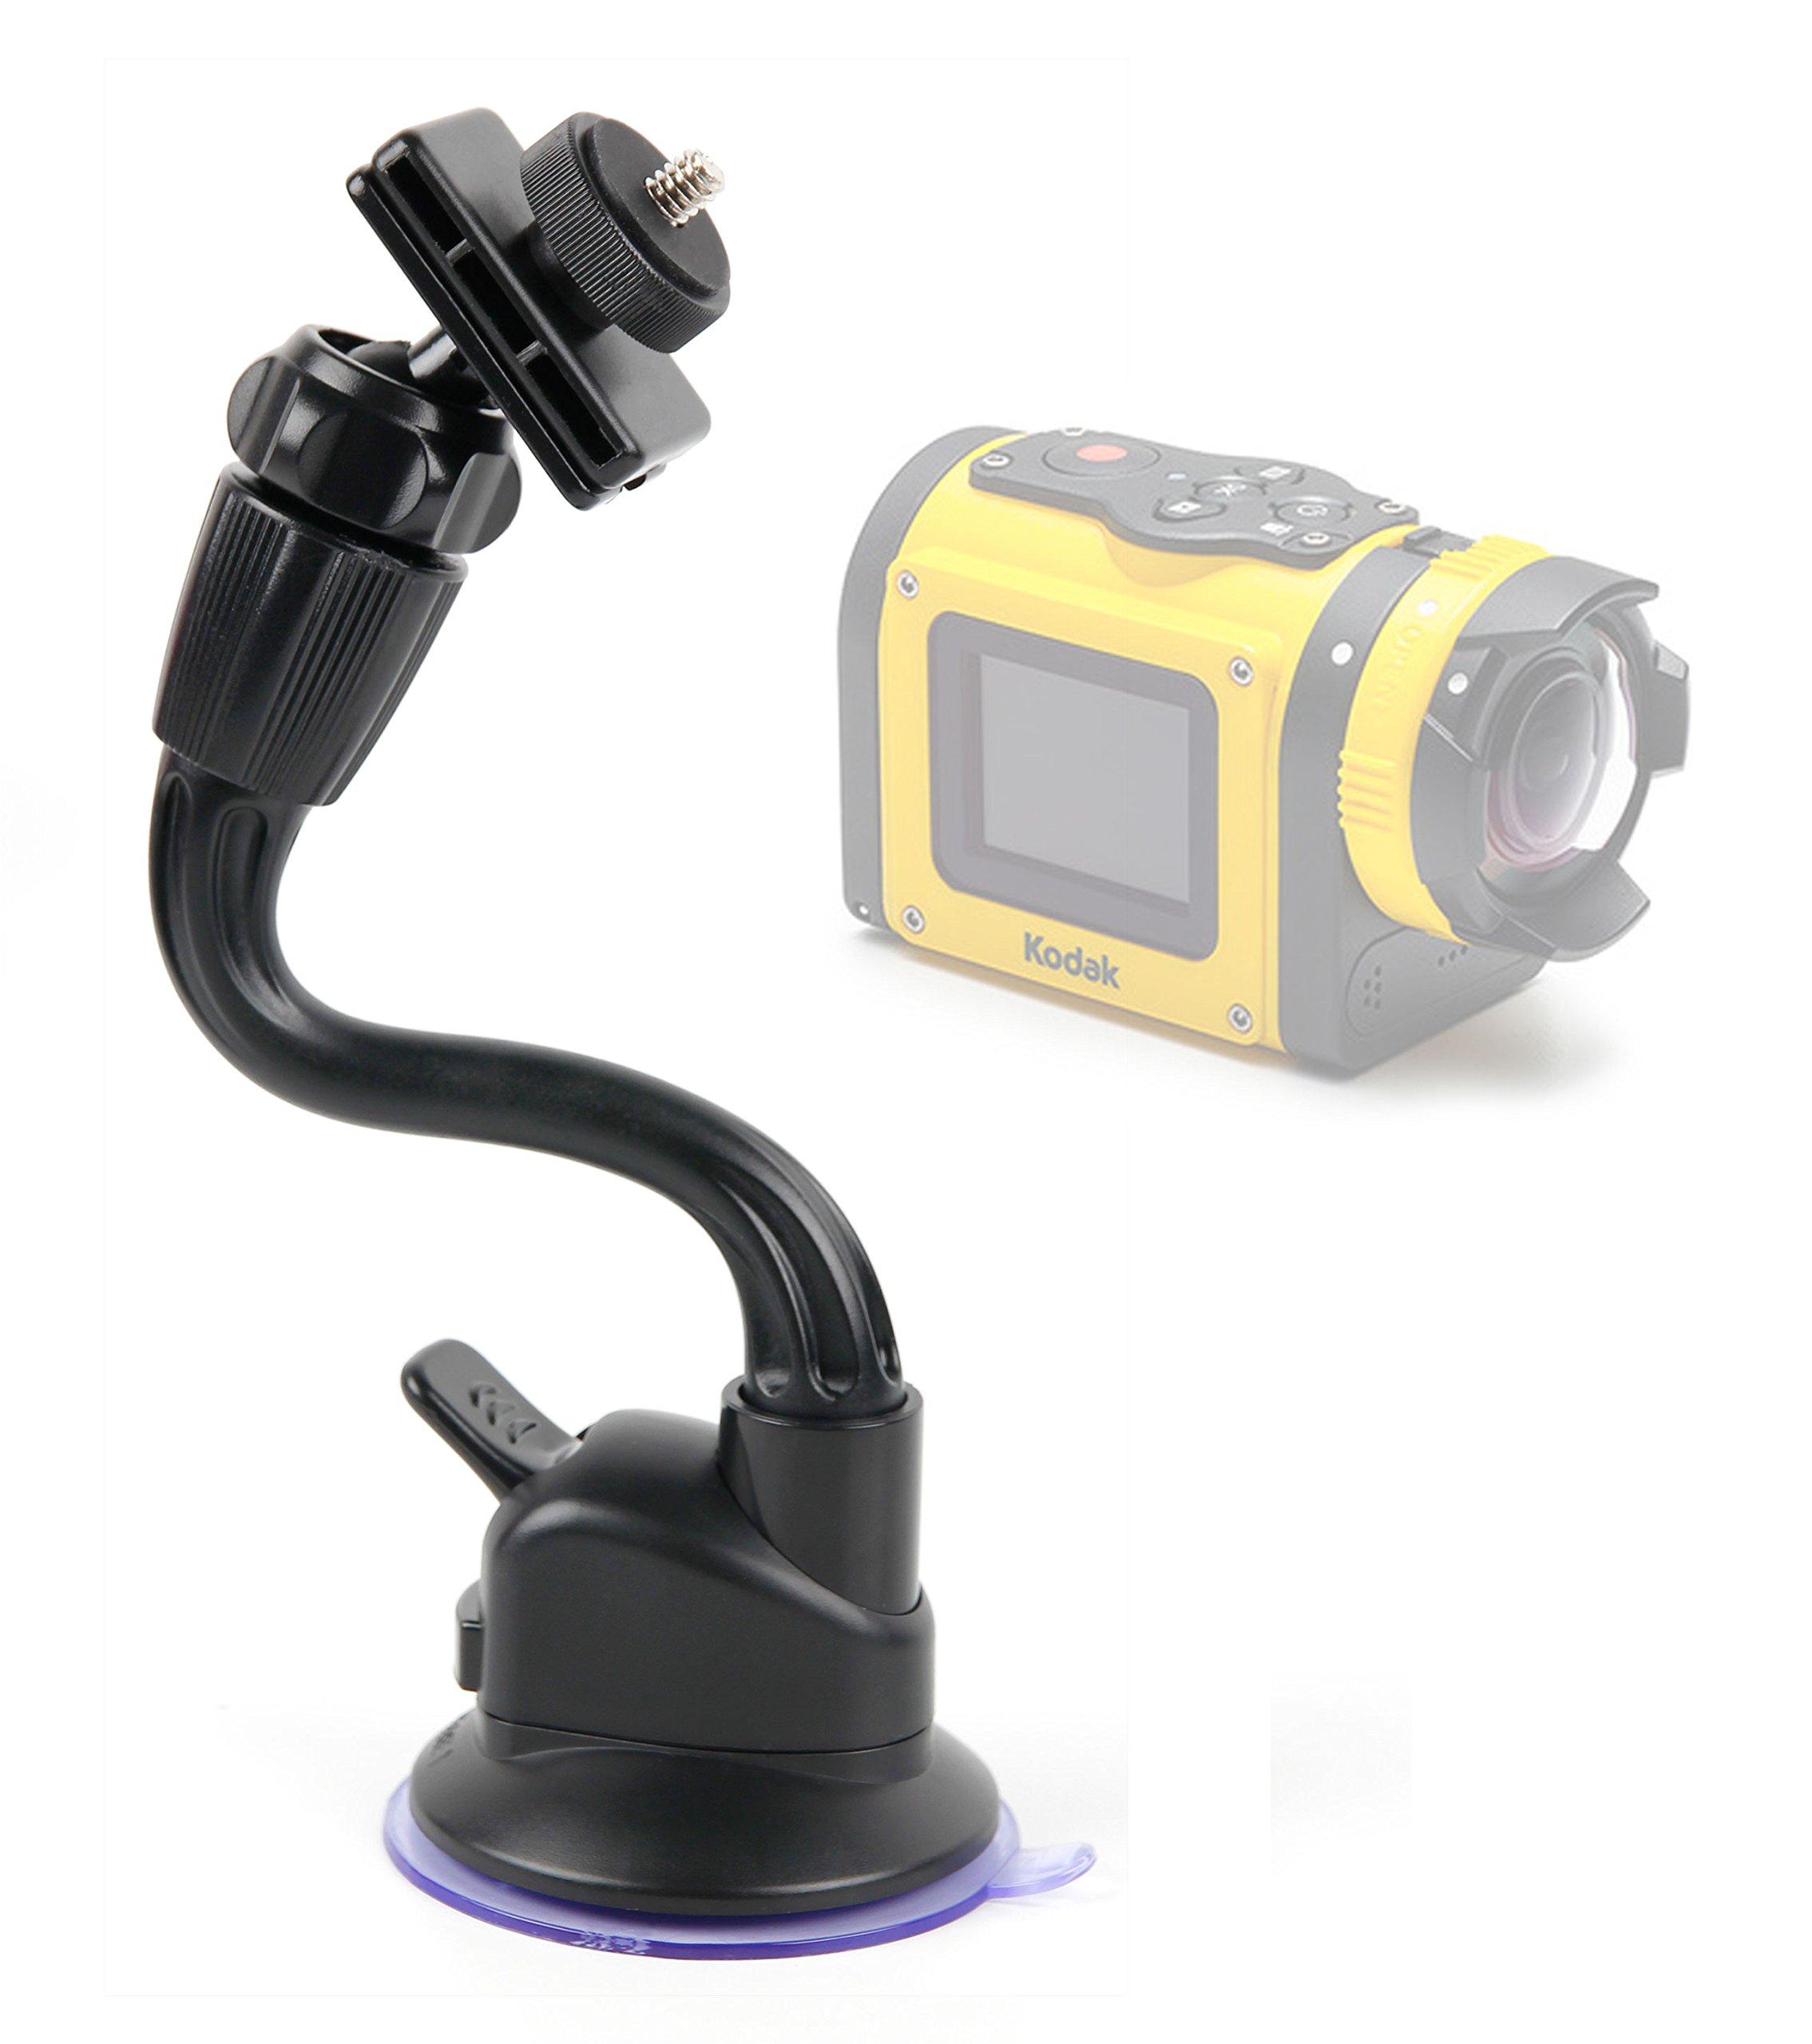 DURAGADGET in Car Anti-Shake Flexible Arm Suction Mount - Compatible with The Kodak SP360 4K | Pixpro SP1 | PixPro SP360 Action Cameras